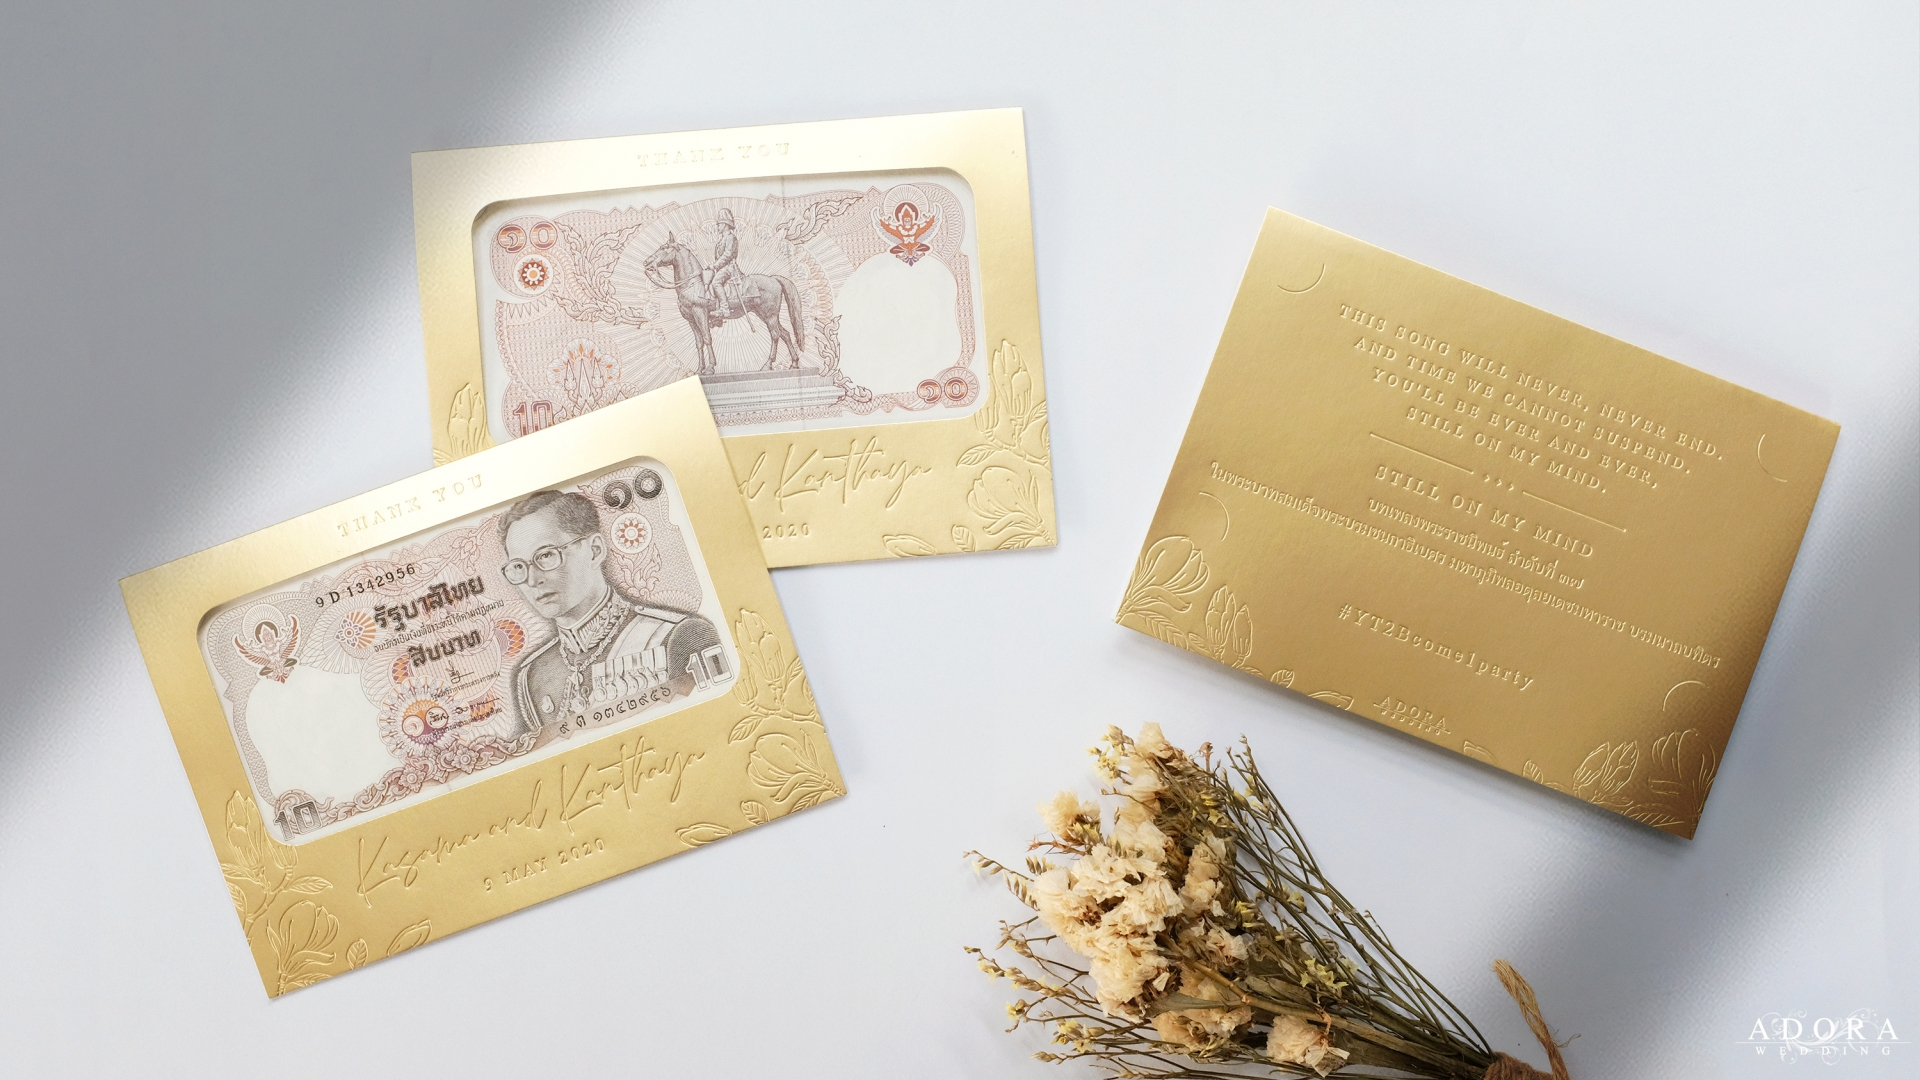 Portfolio ซองใส่ธนบัตรสีทอง แบบ LetterPressed สวยหรูไม่เหมือนใคร